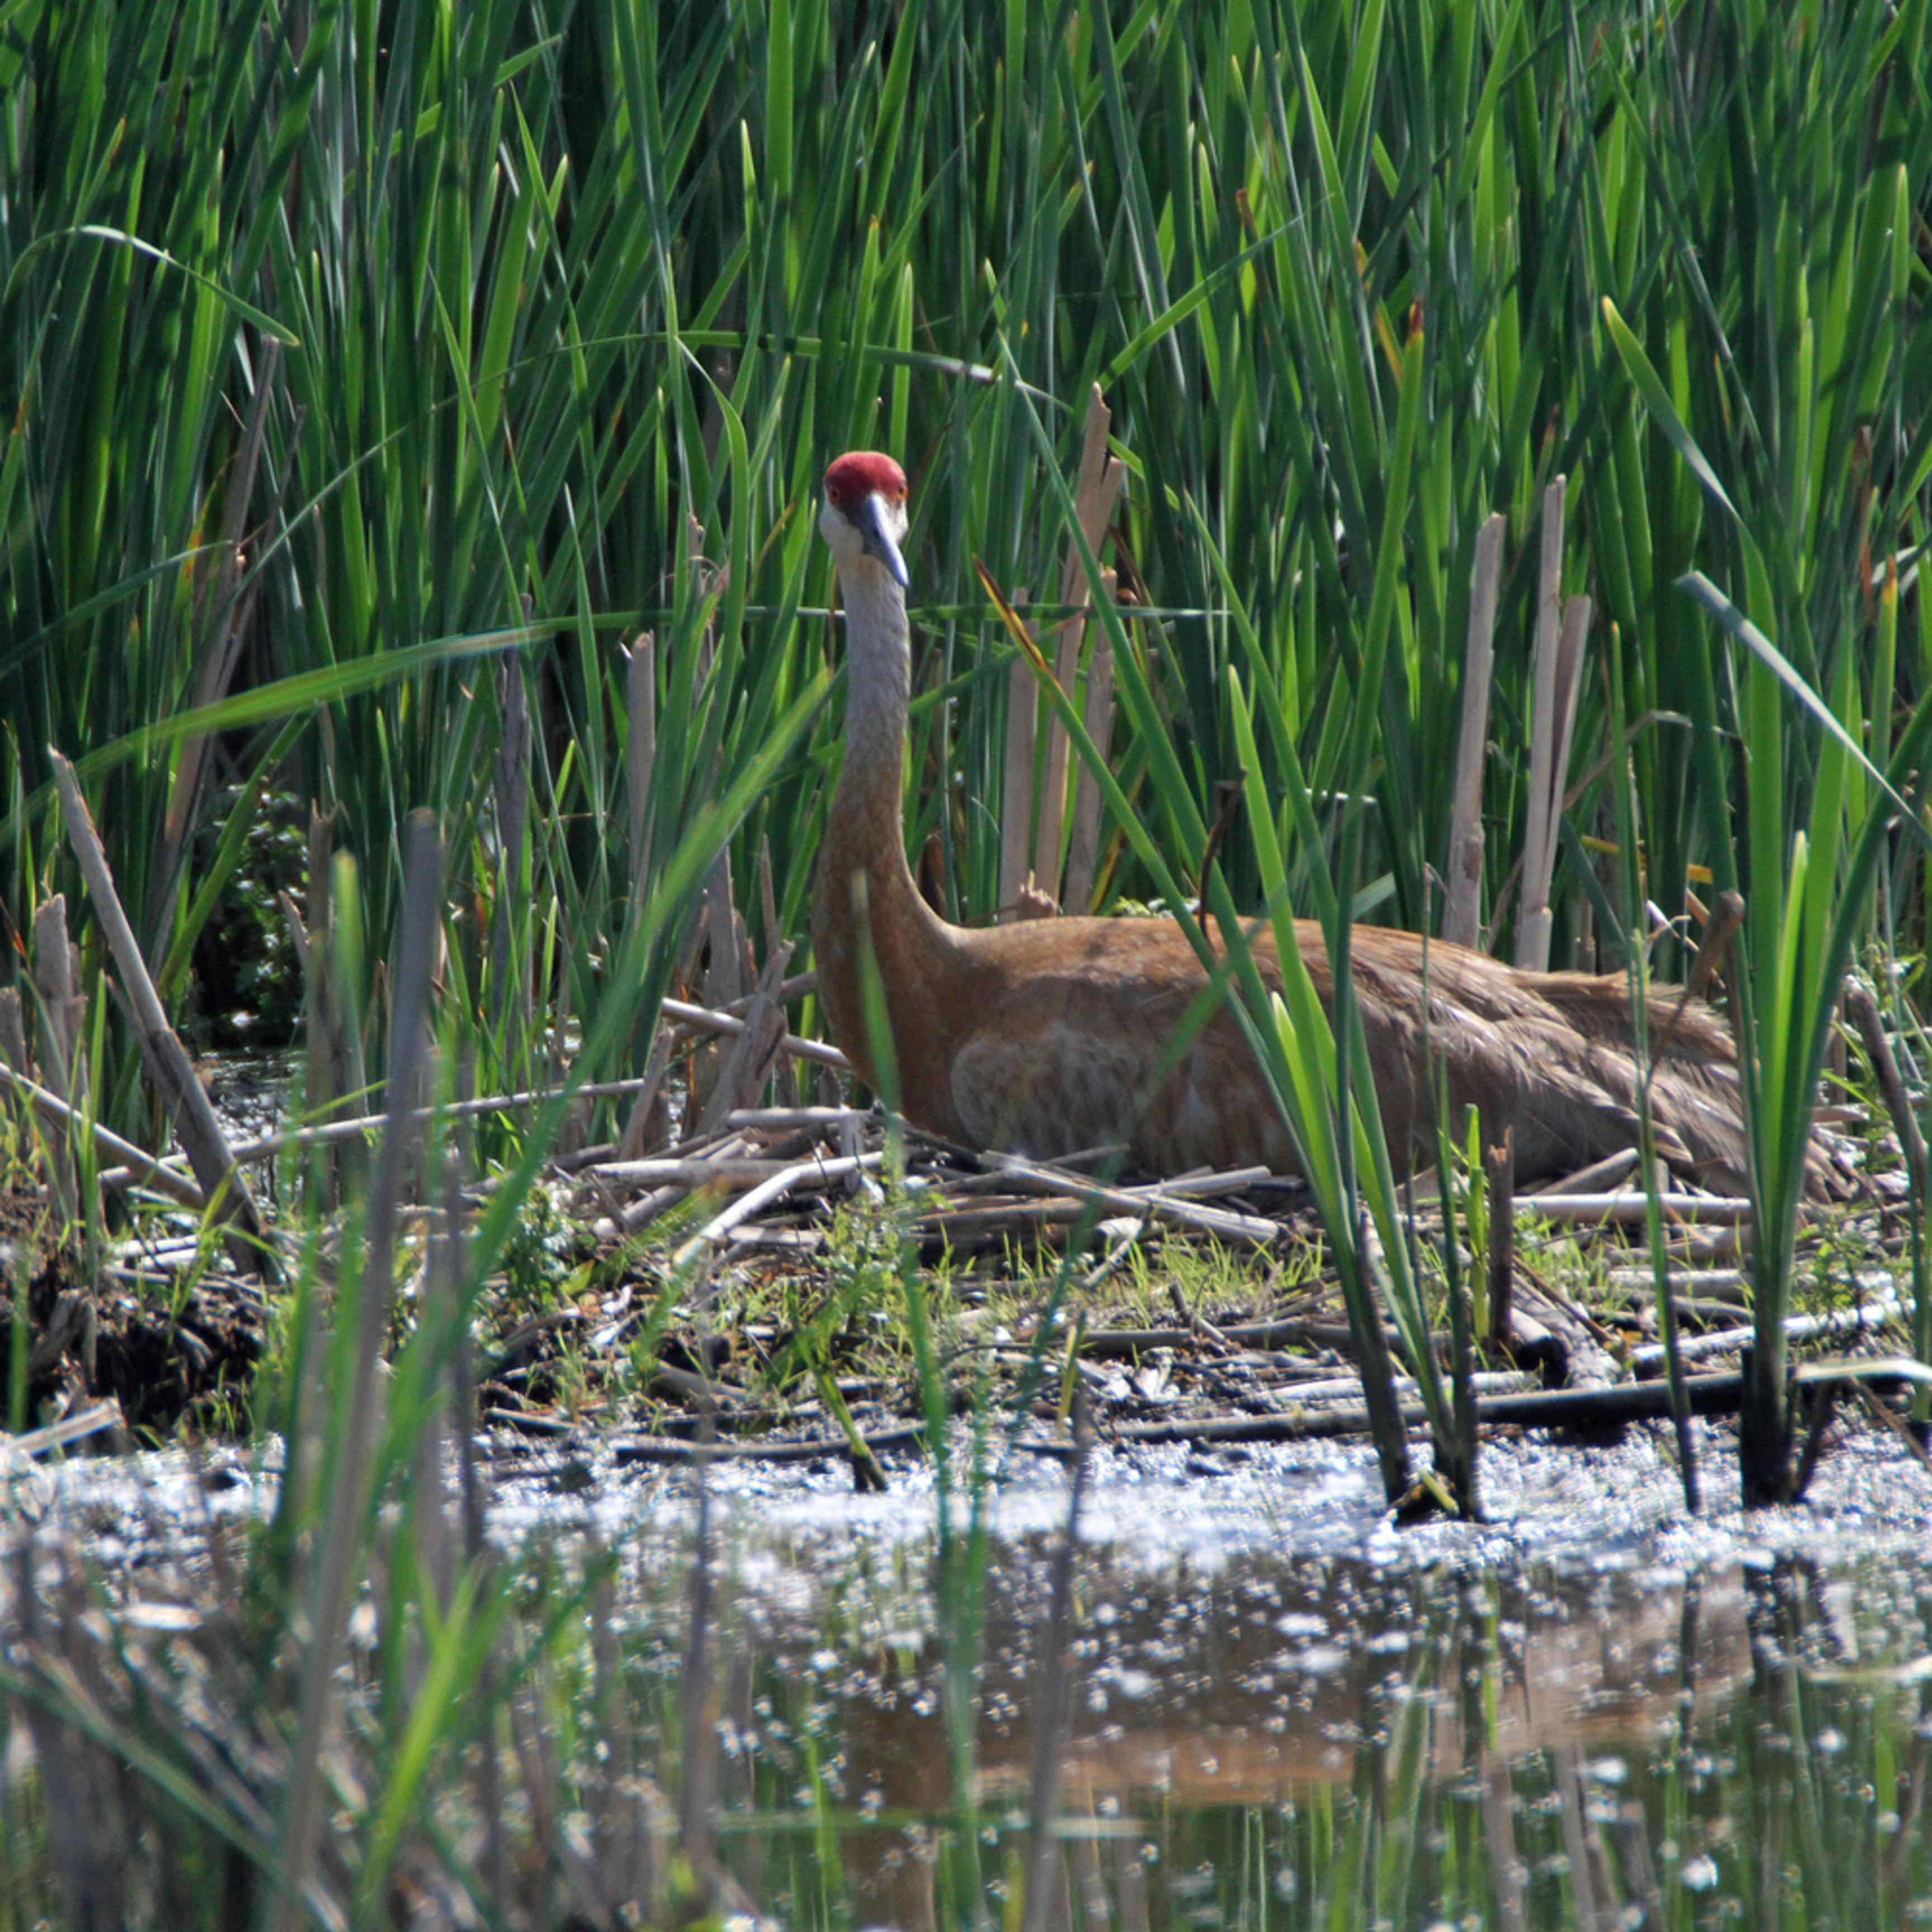 Nesting sandhill crane bppwsq